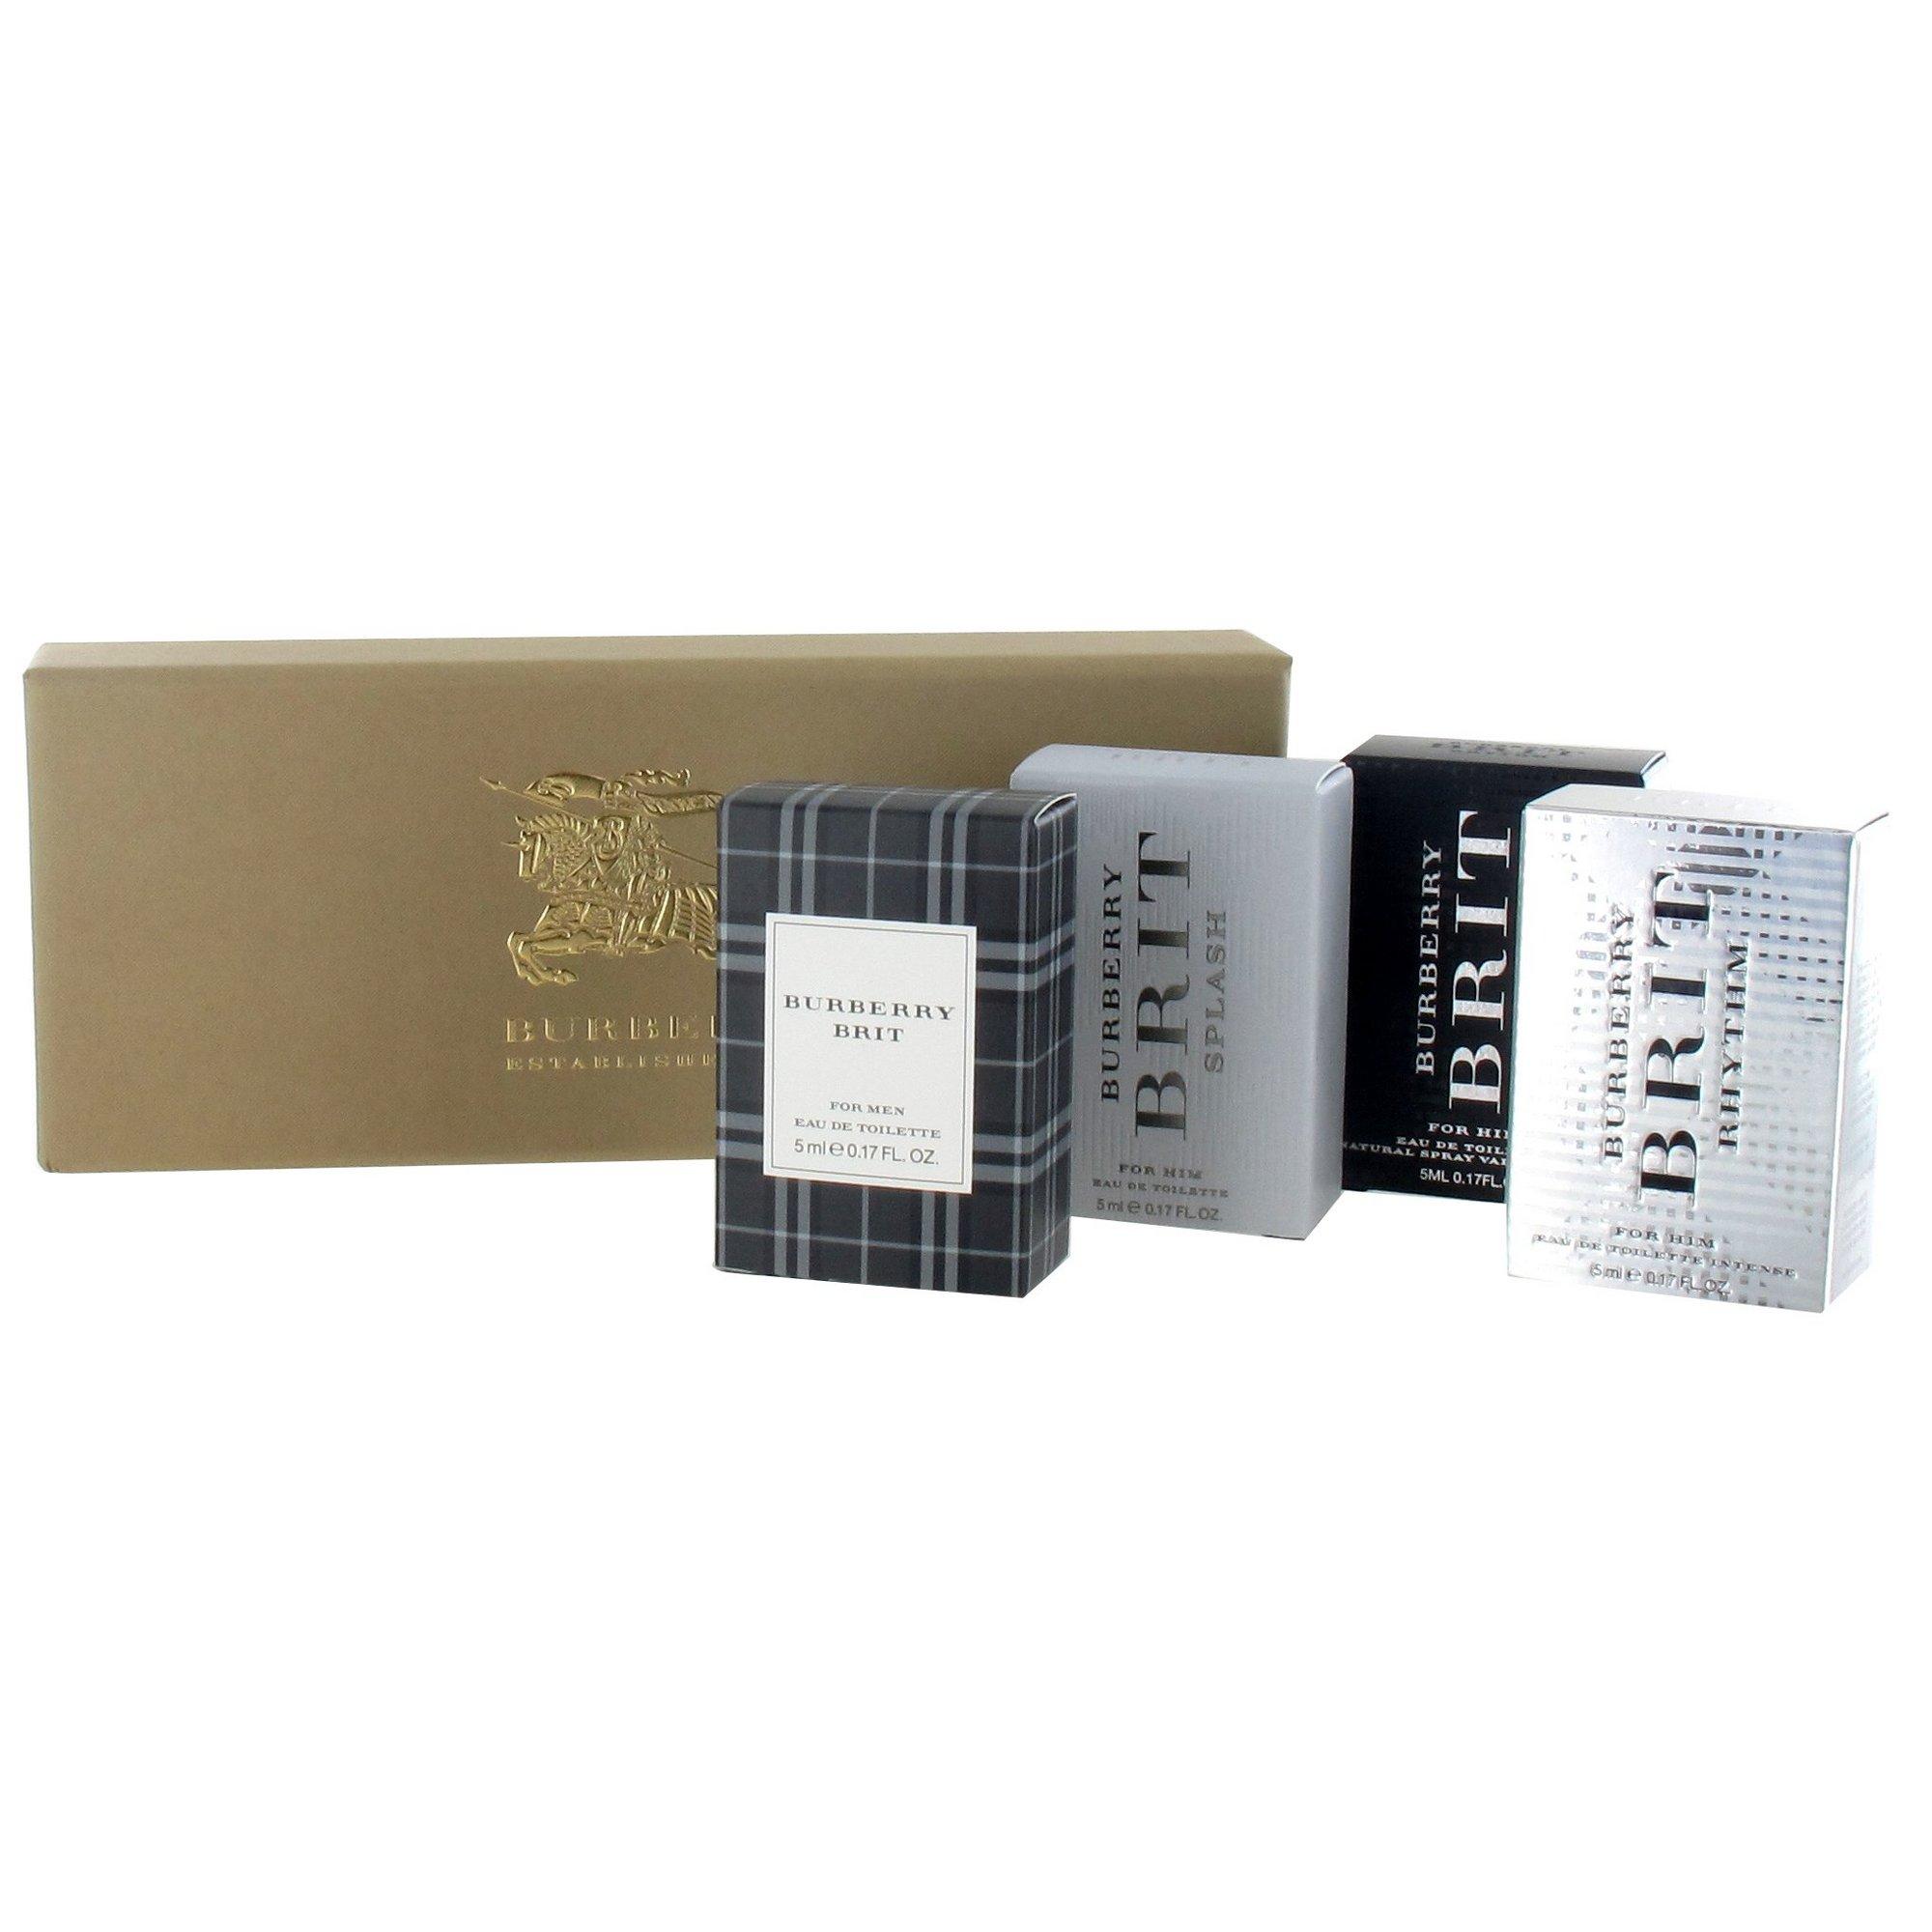 Image of Burberry Man Mini Fragrance Gift Set